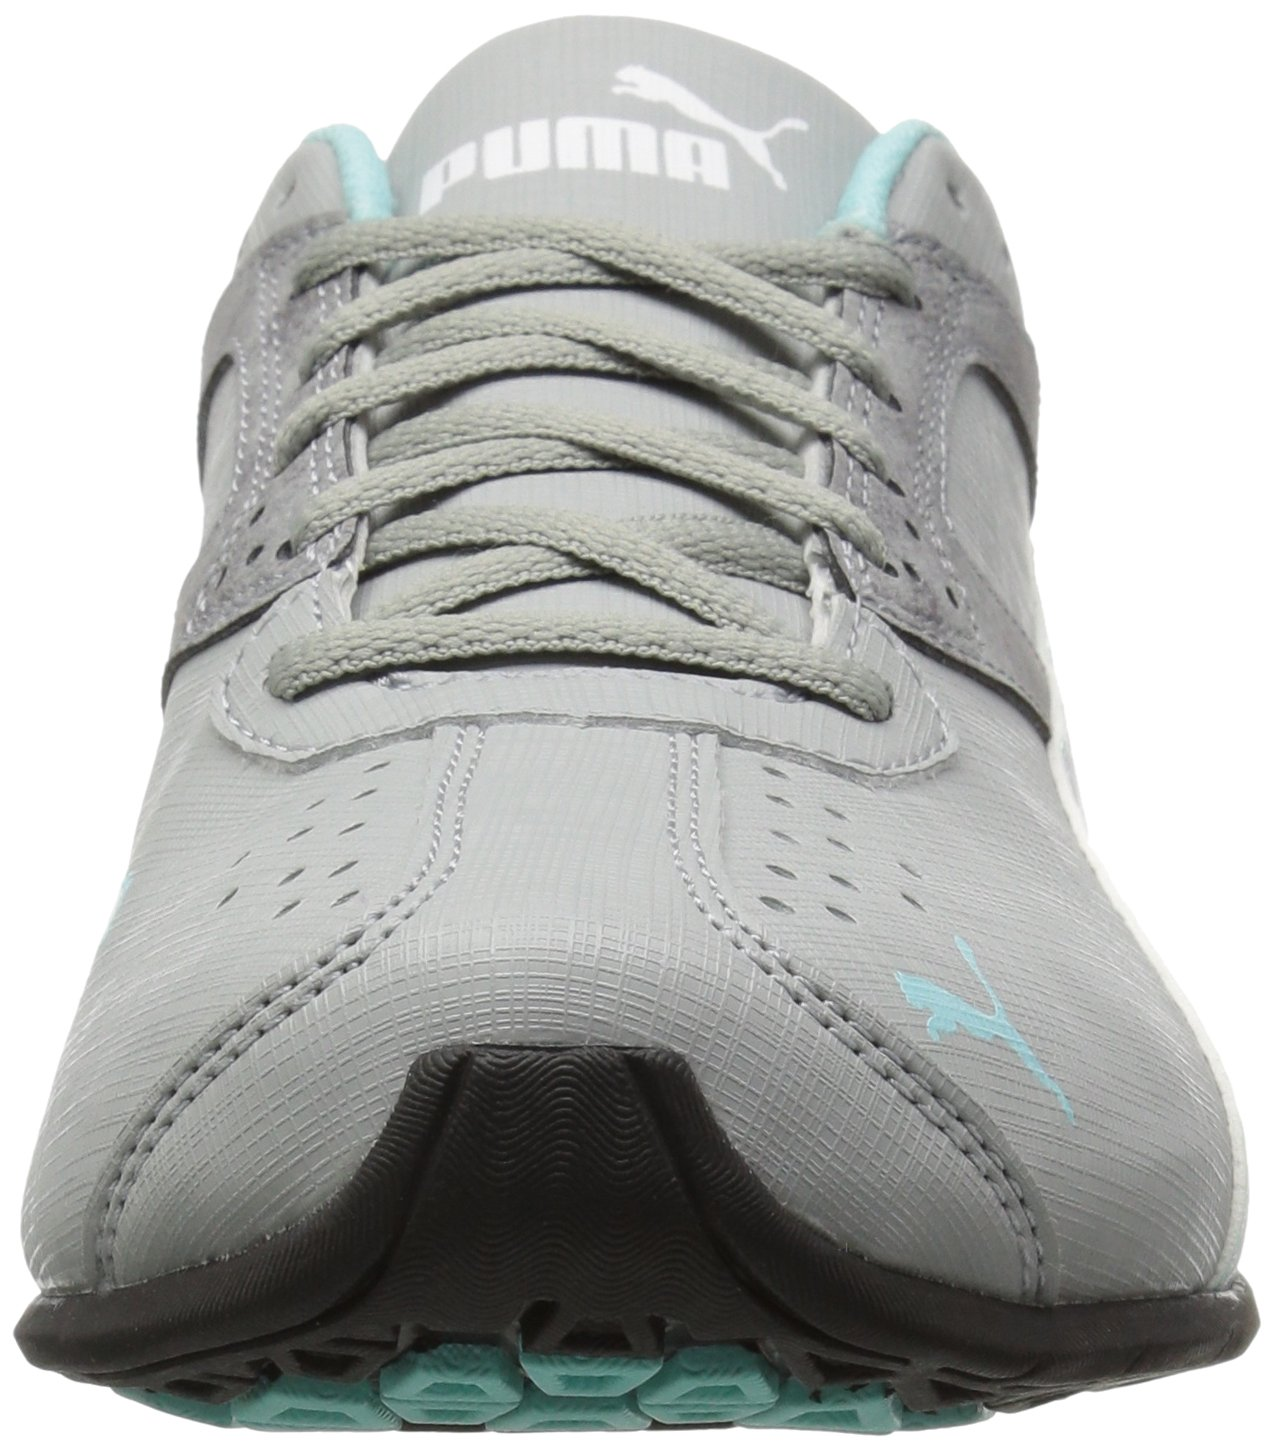 PUMA Women's Tazon 6 Accent WN's Cross-Trainer Shoe B01LPWS4AY 10 B(M) US|Quarry-puma White-aruba Blue